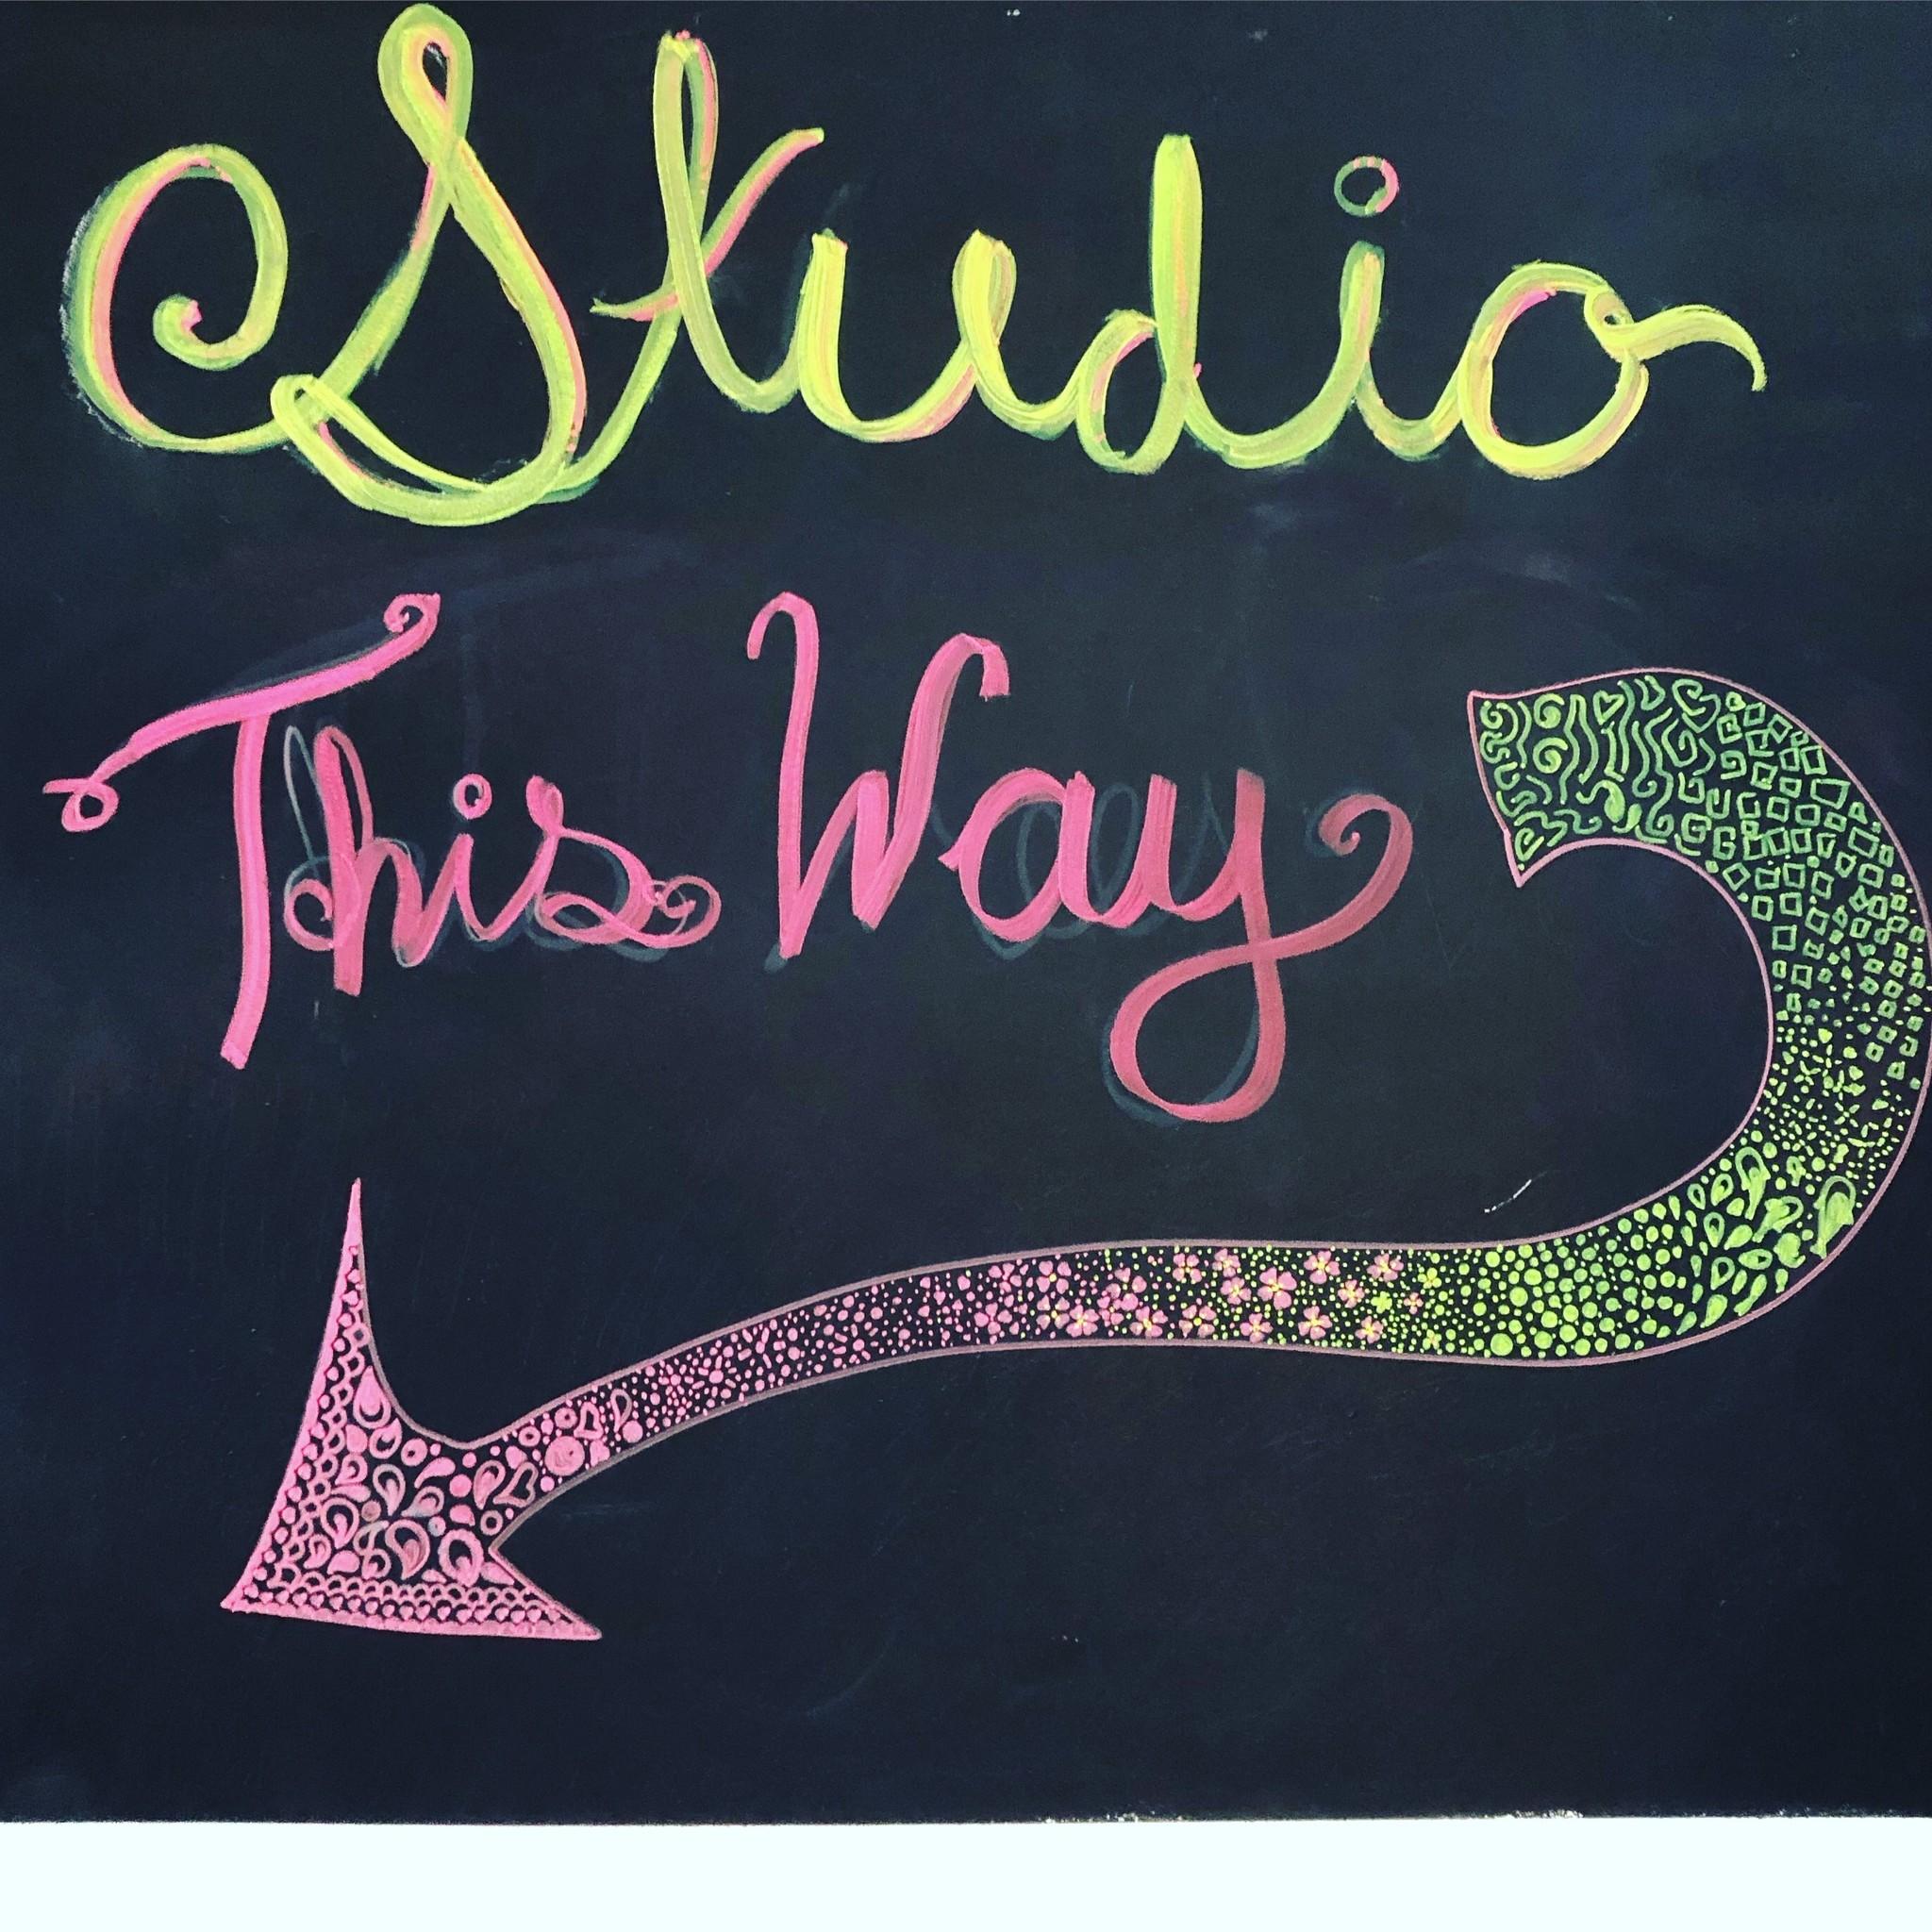 Studio news at Evymama